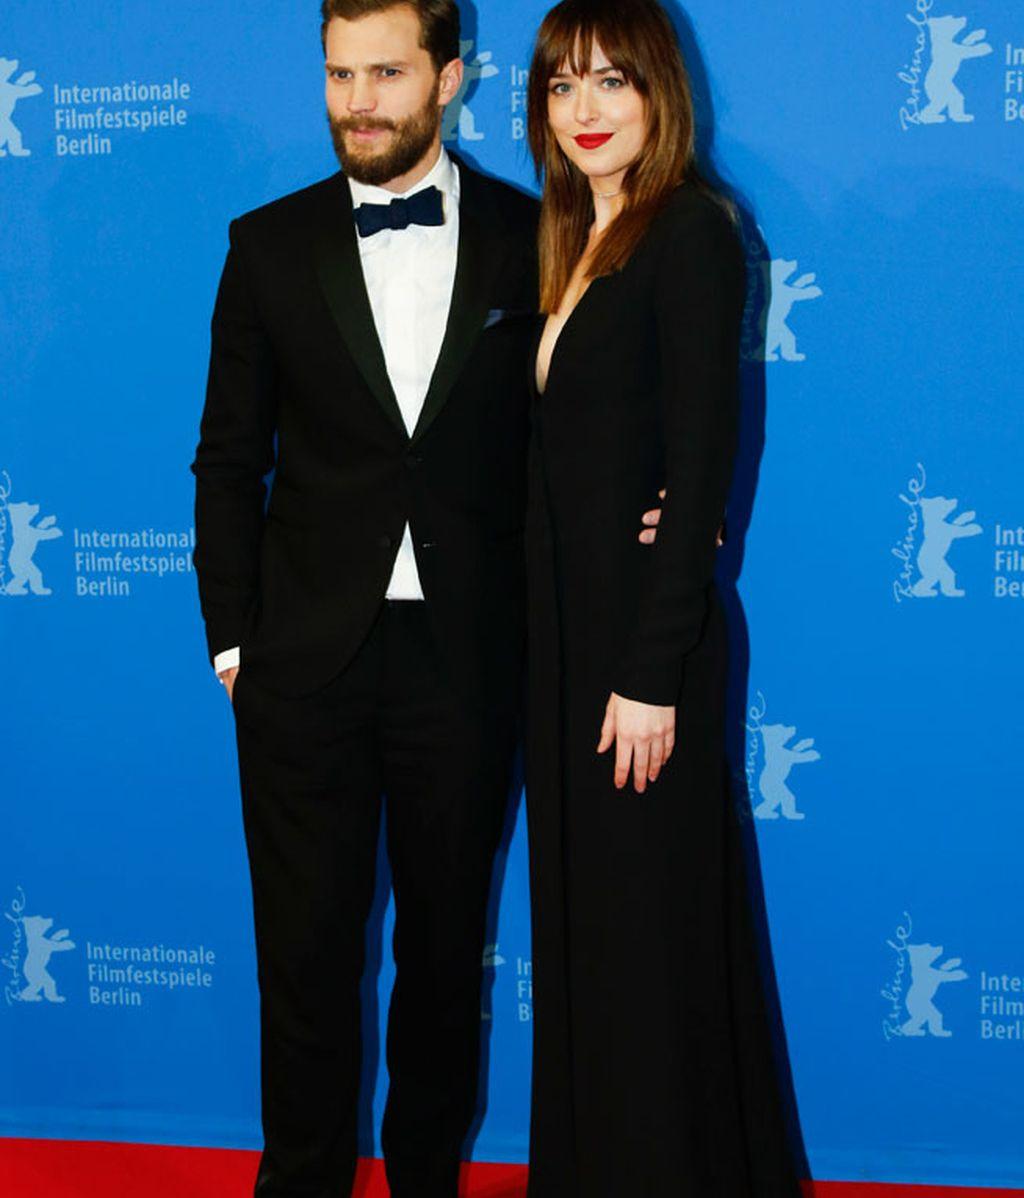 Jamie Dornan y Dakota Johnson, entre los asistentes